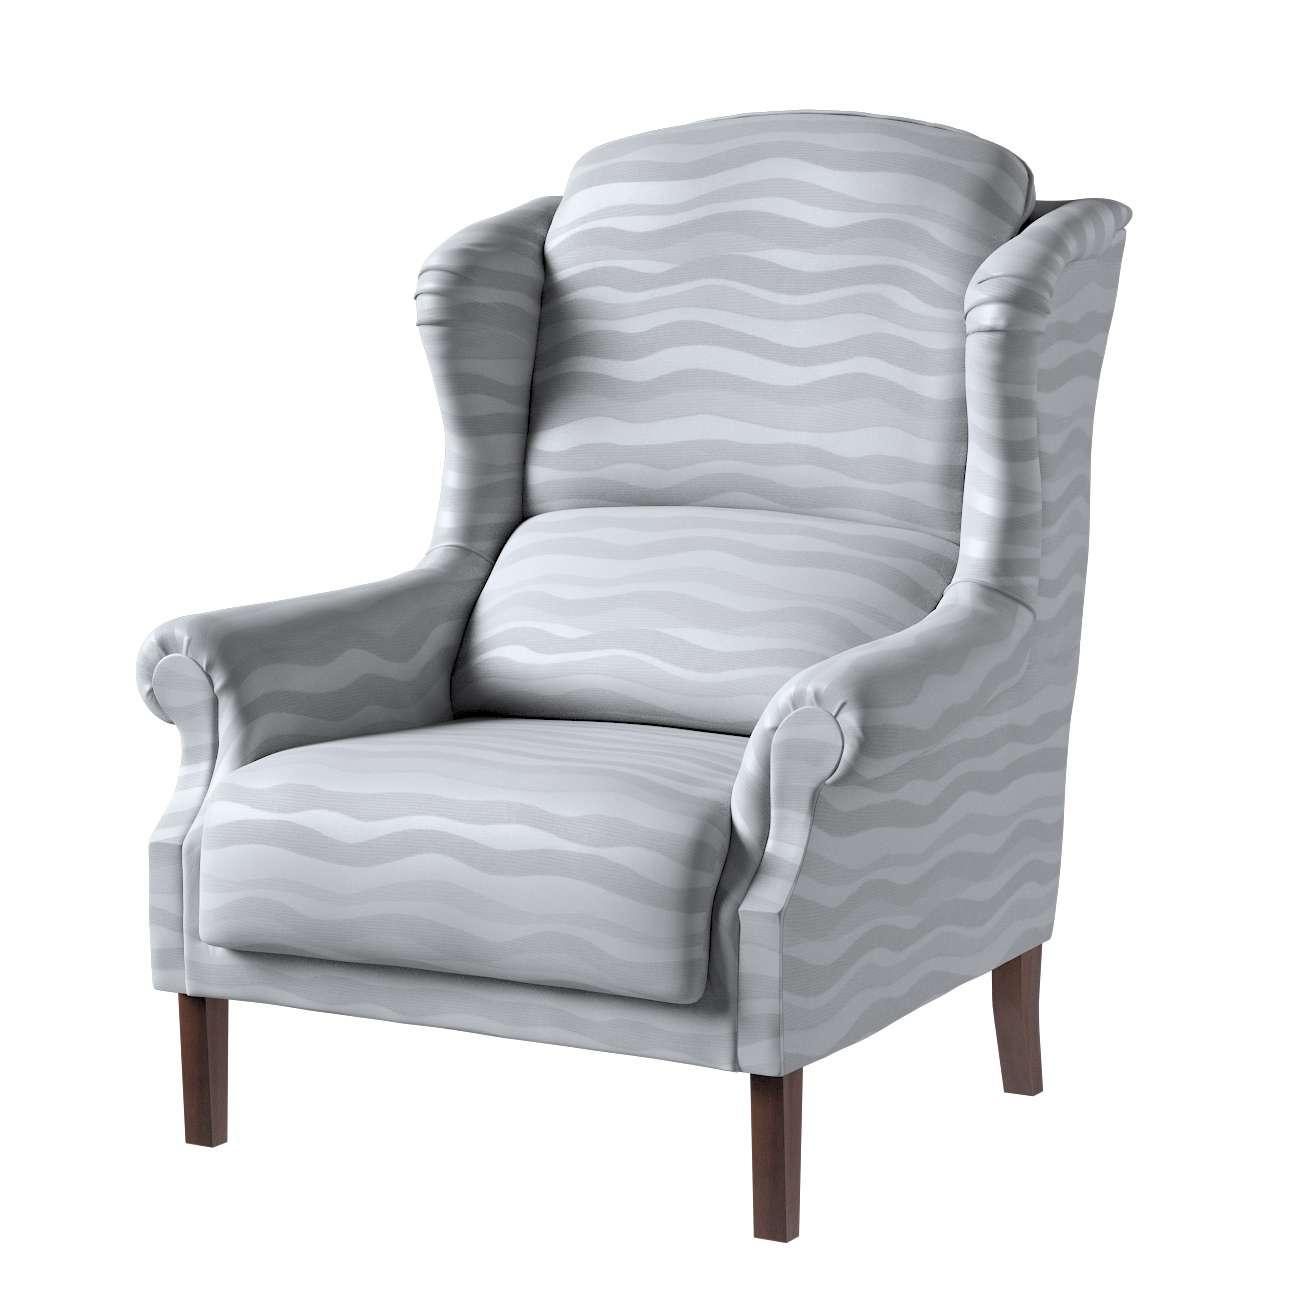 Fotel Unique w kolekcji Damasco, tkanina: 141-72